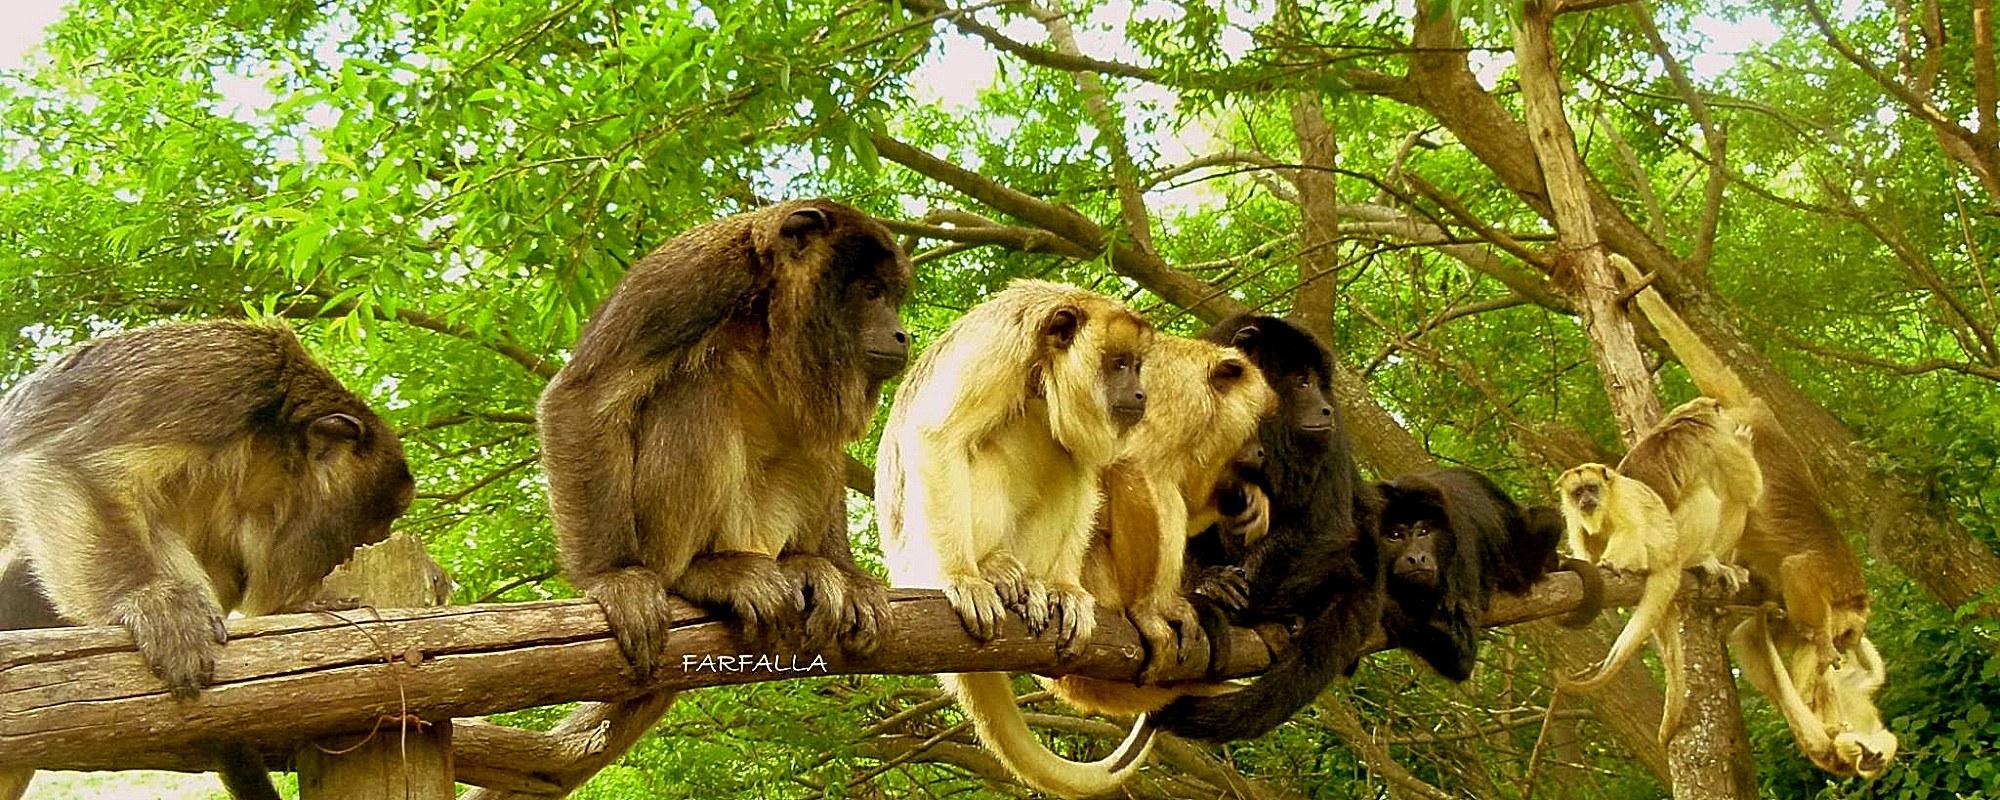 Monkeys at the Argentina sanctuary